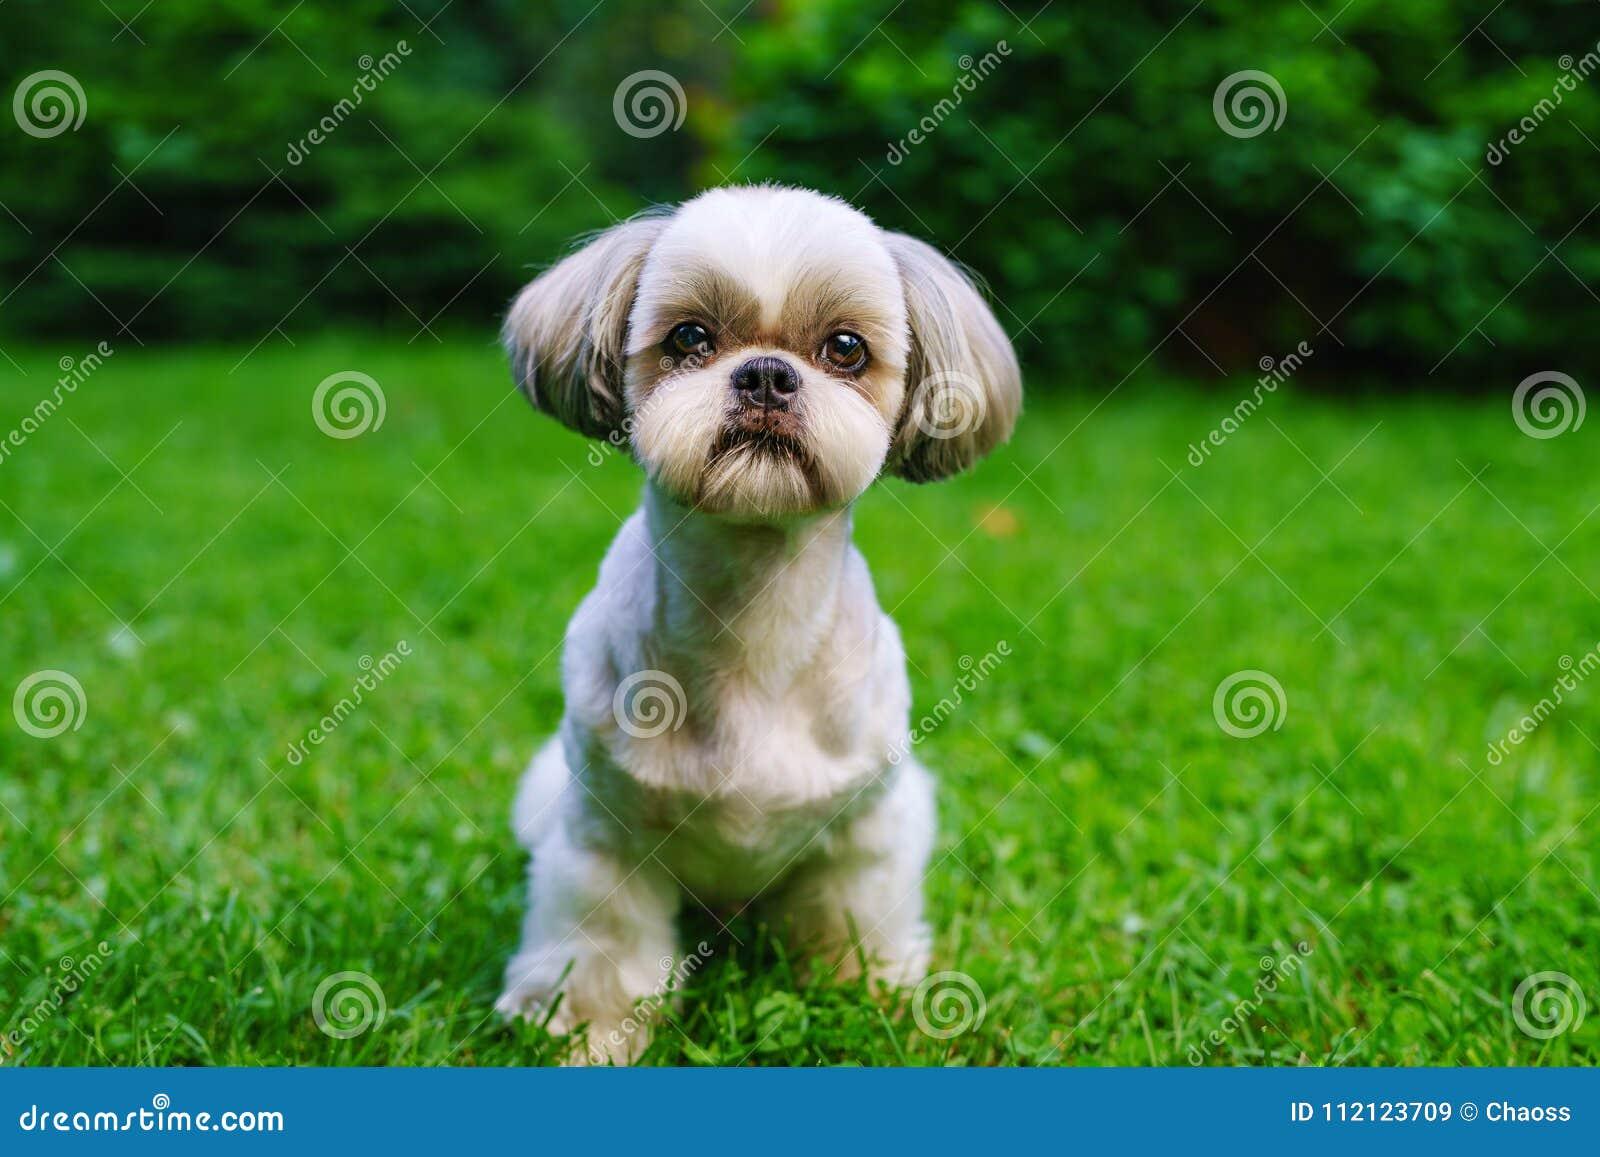 Shih Tzu Hund Stockbild Bild Von Vibrant Landschaft 112123709